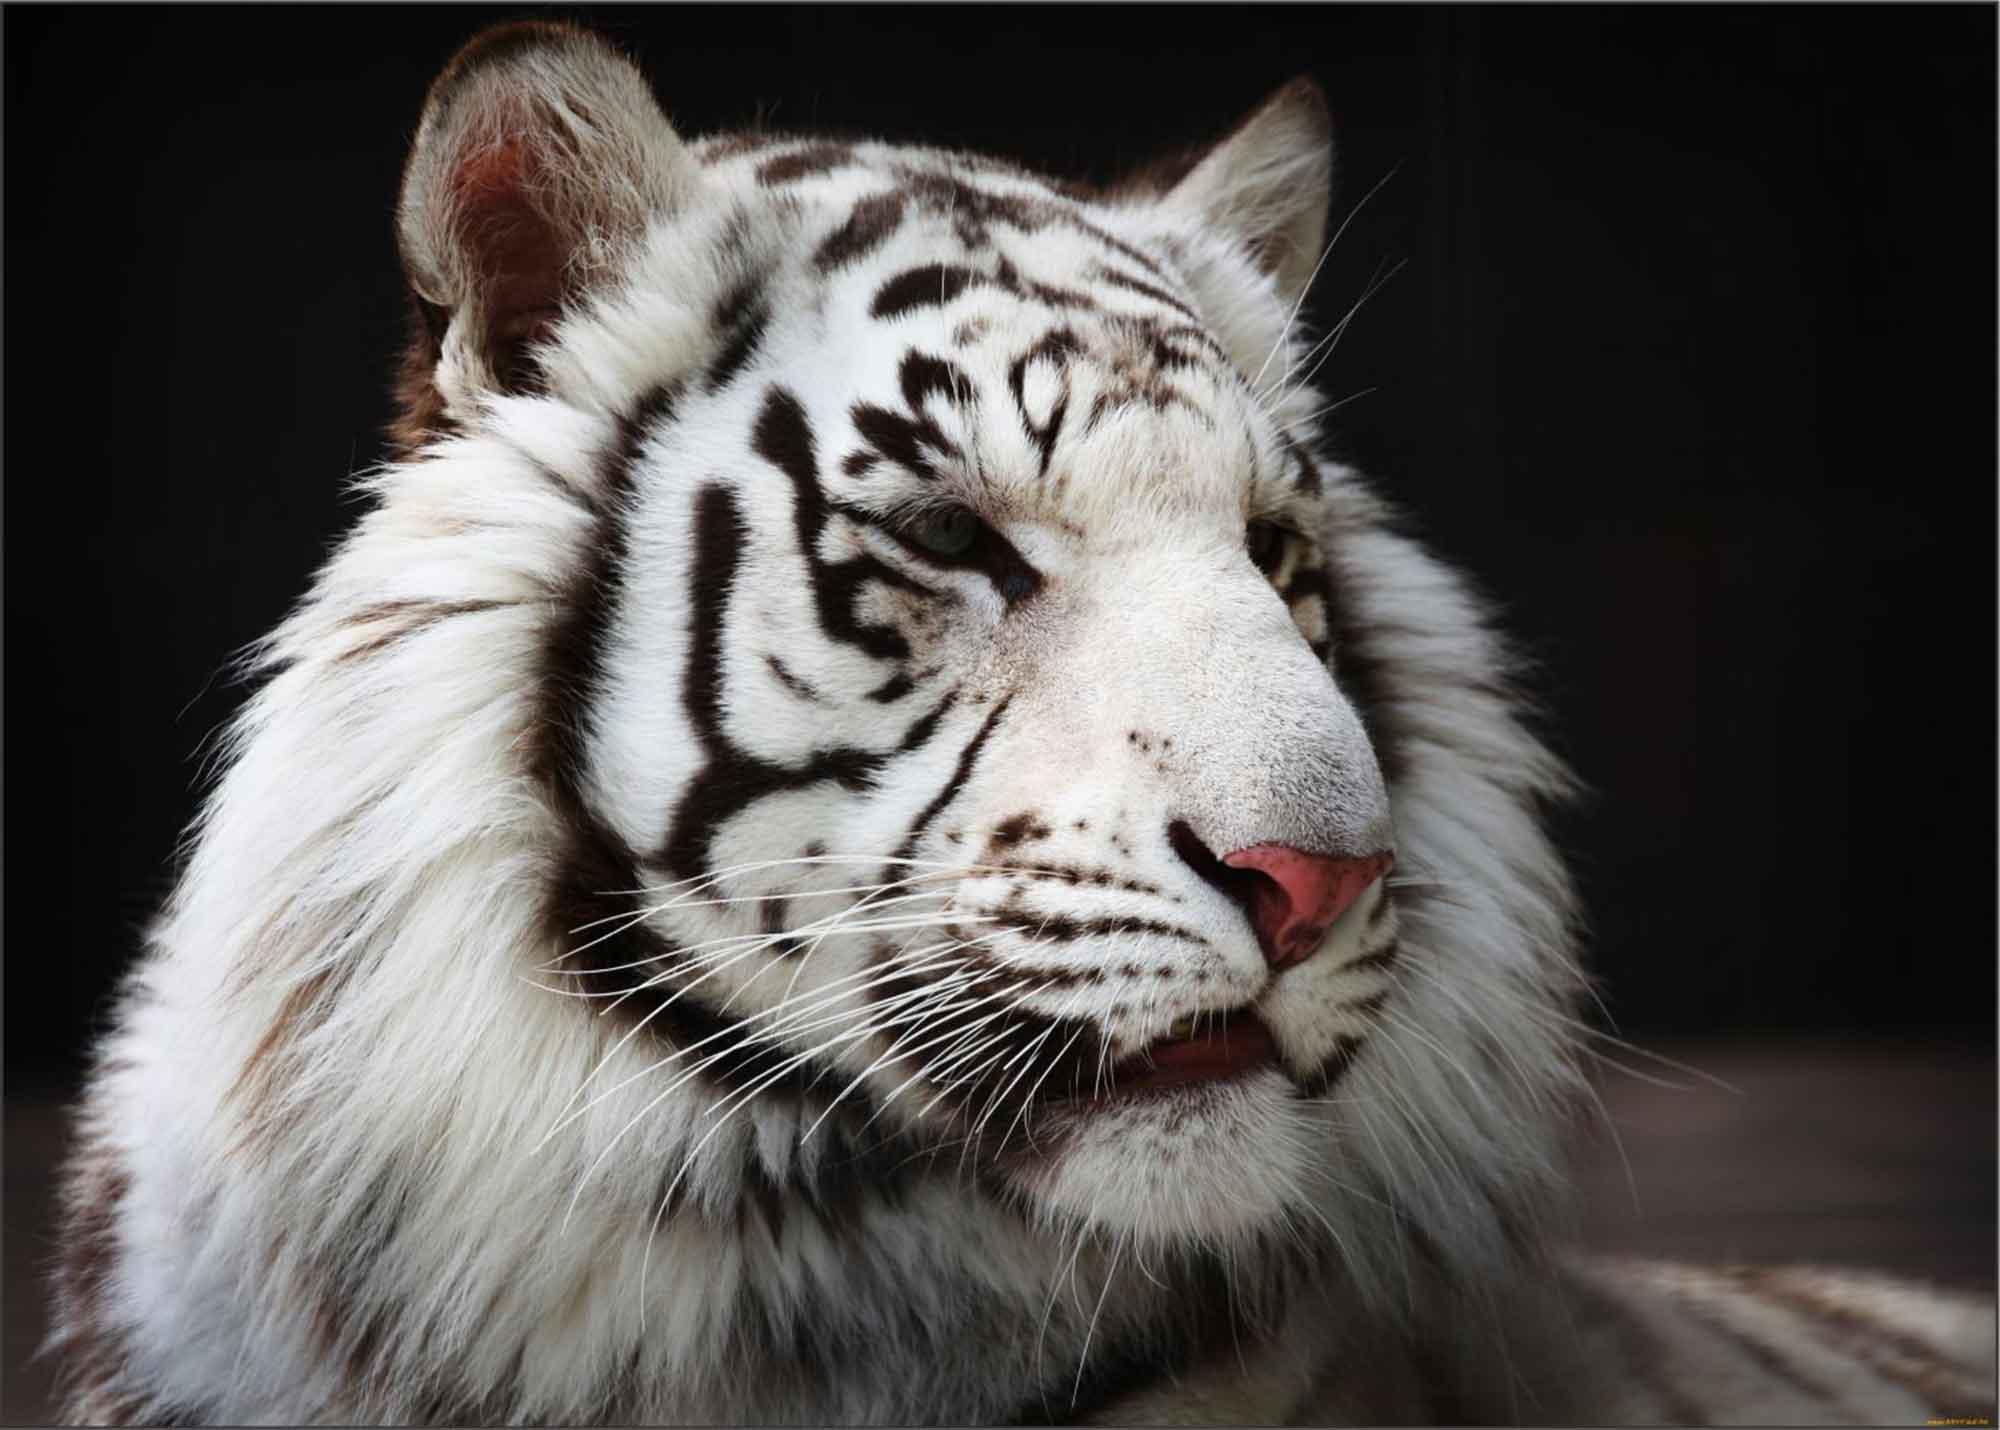 Papel De Parede 3D | Animais  0005 - Adesivo de Parede  - Paredes Decoradas